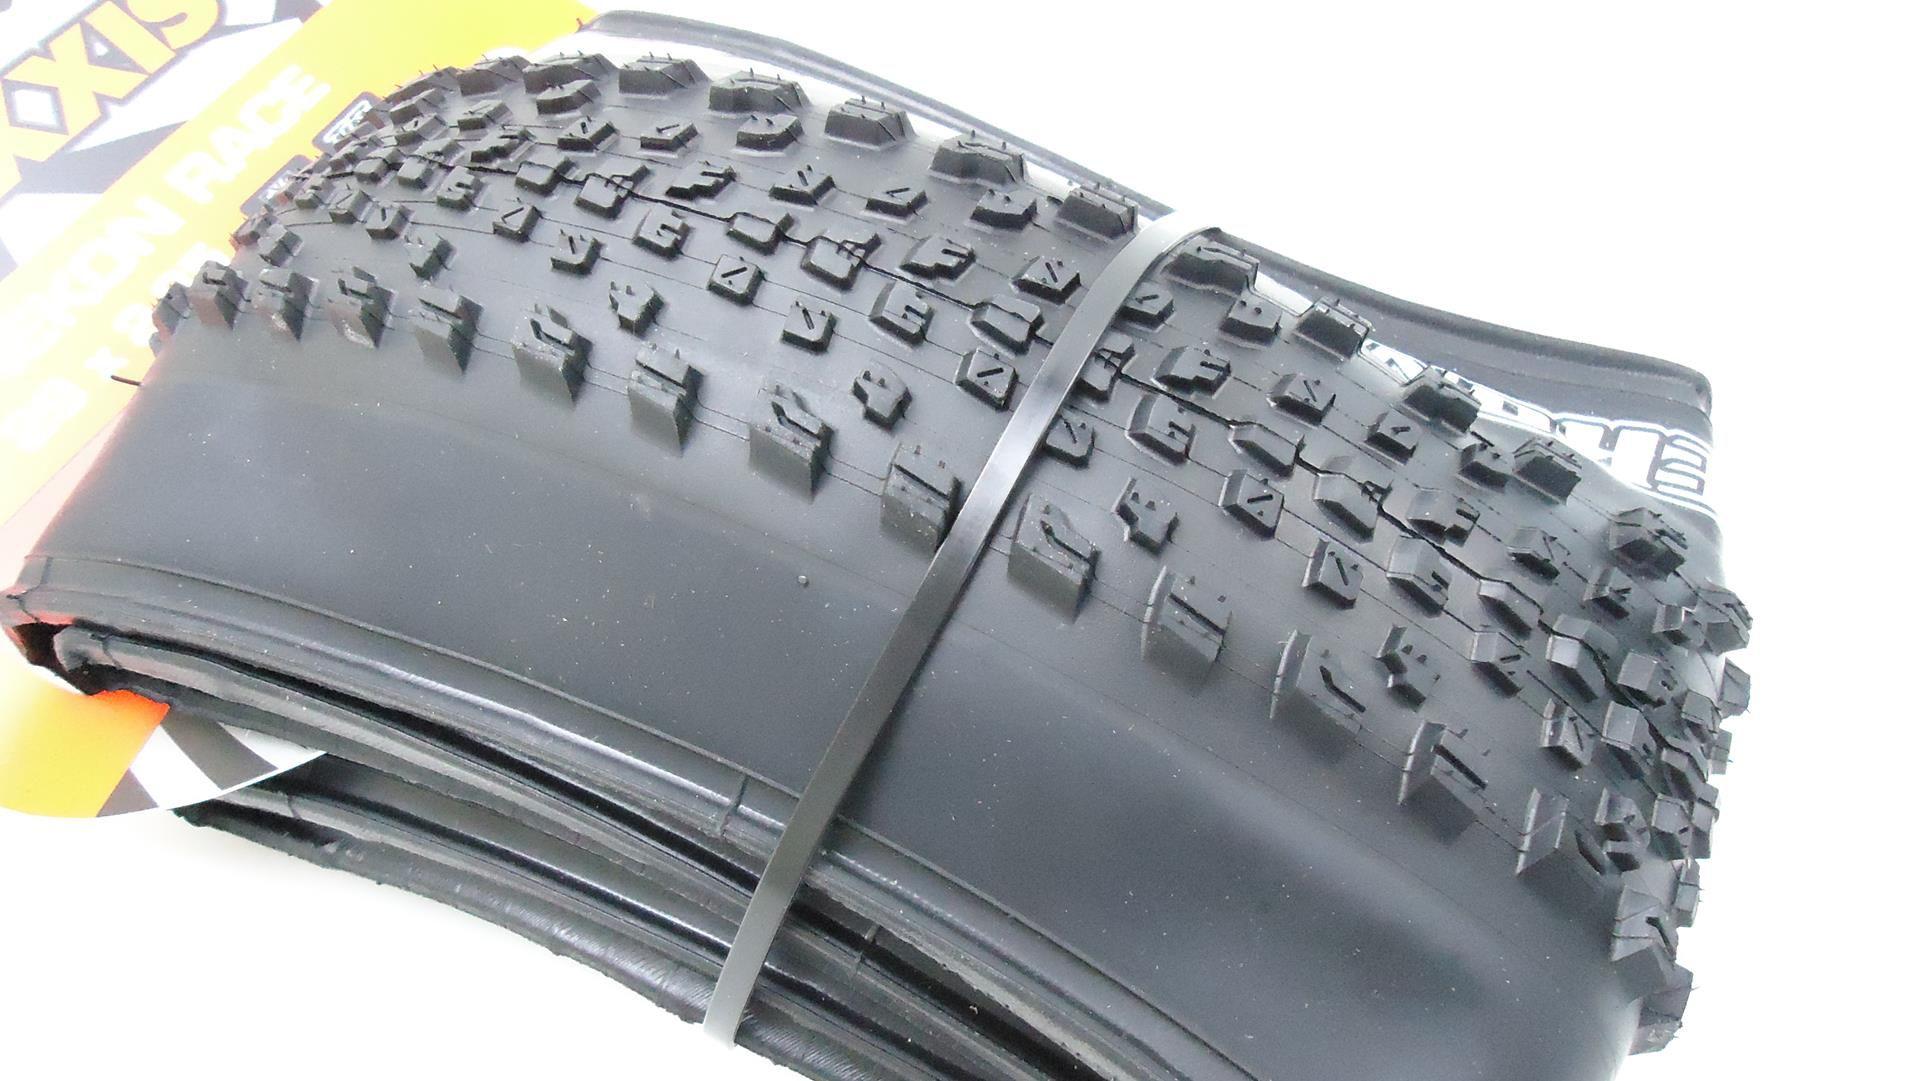 Pneu Mtb Maxxis Recon Race 29 2.35 Tubeless Ready Exo Protection em Kevlar 120 TPI